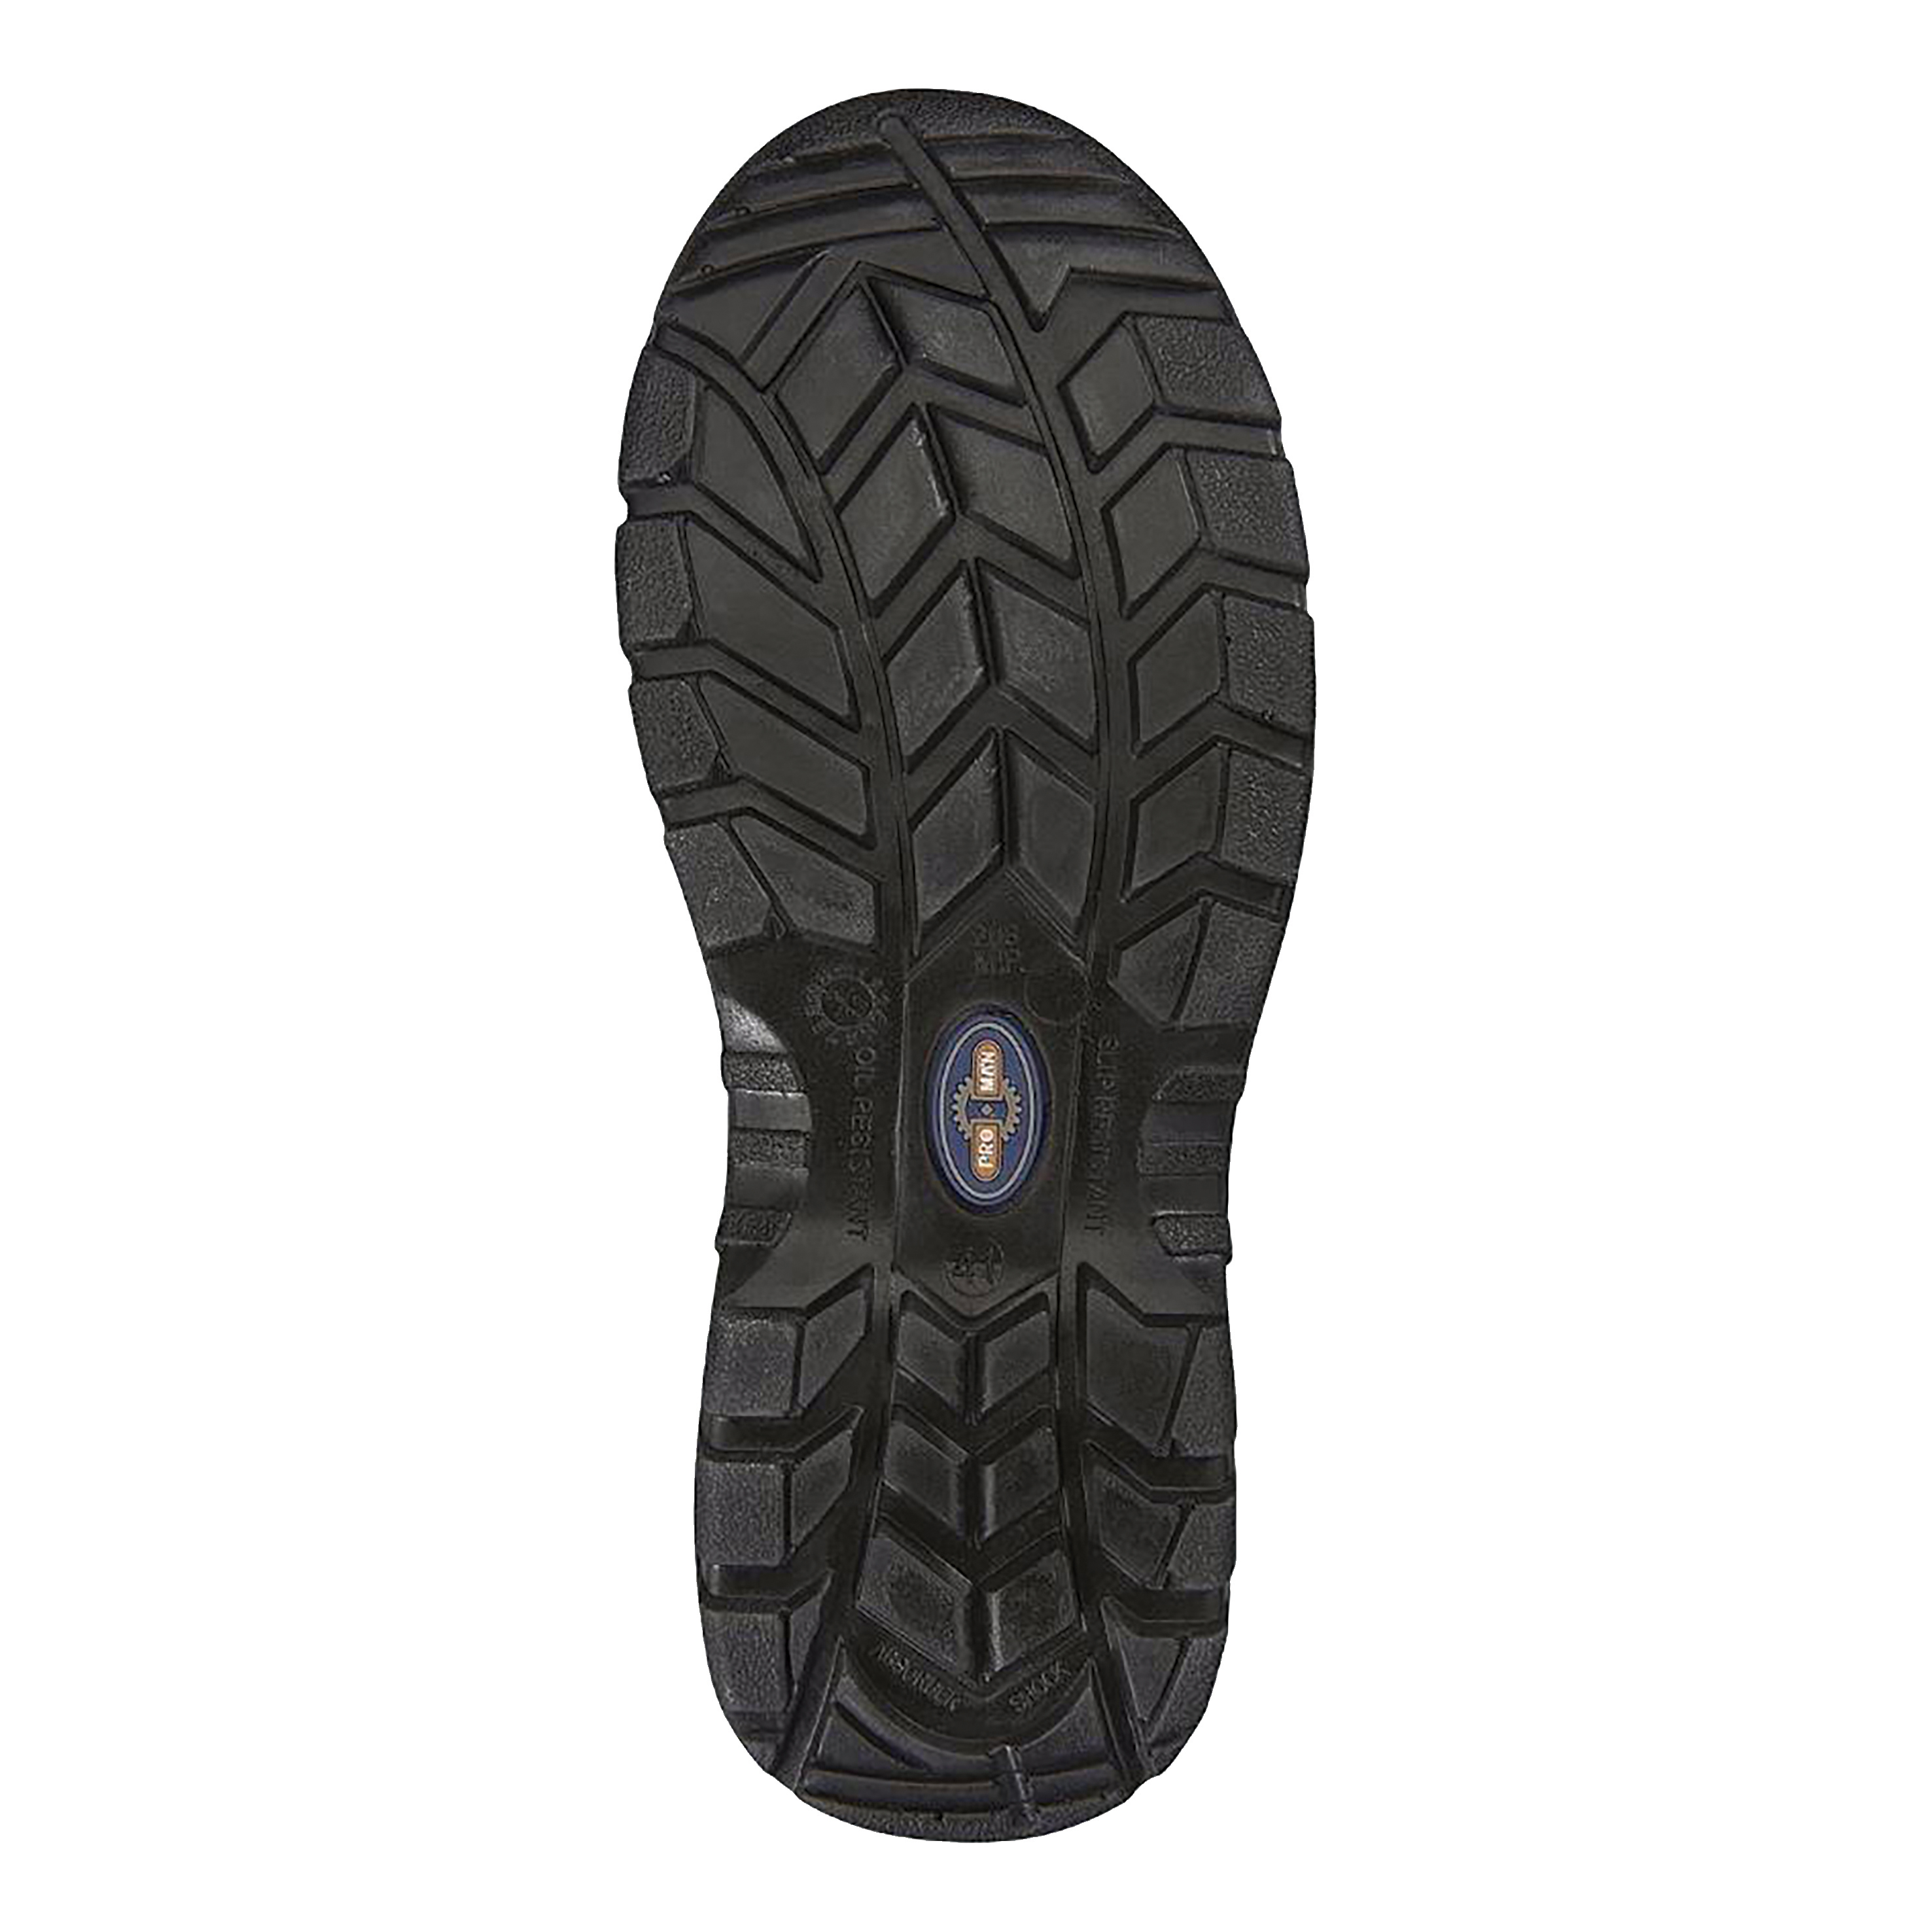 Chukka Boot Leather Steel Toecap & Midsole Size 10 Black Ref PM100 10